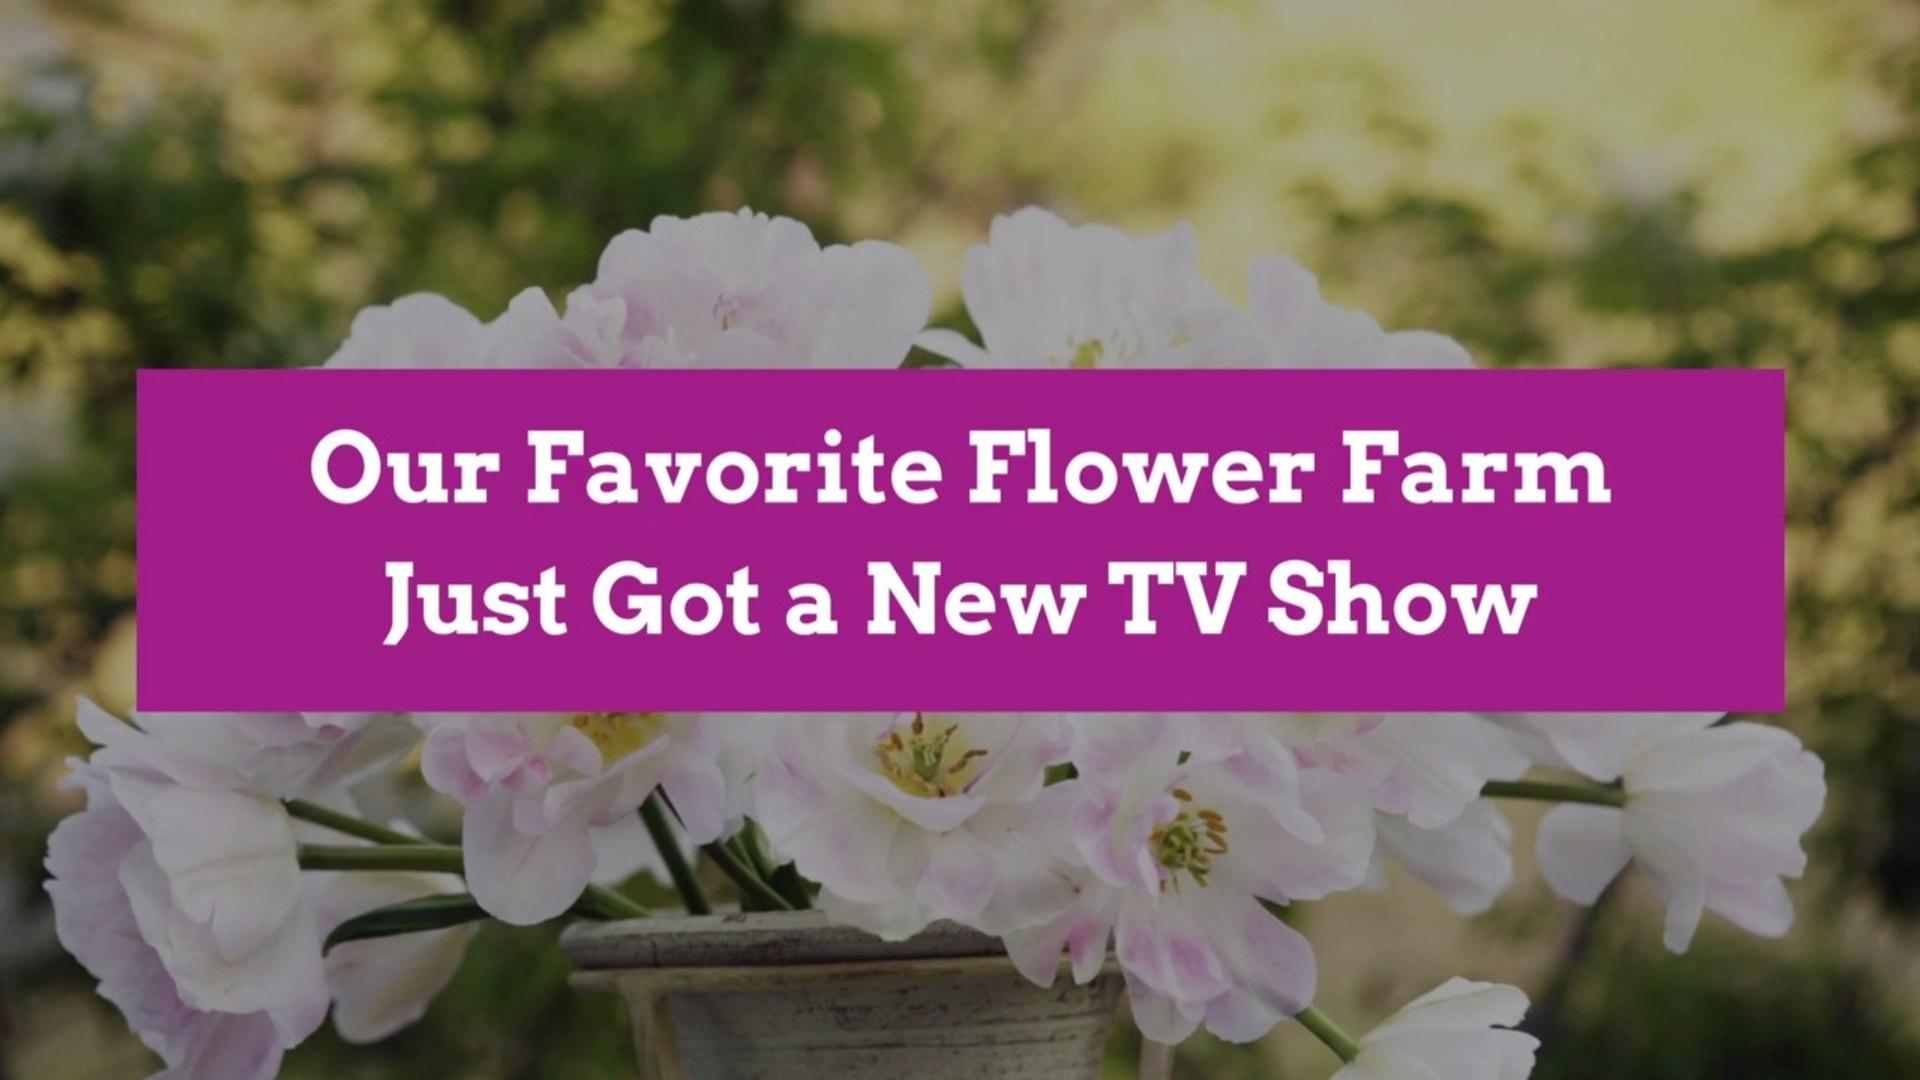 Our Favorite Flower Farm Just Got a New TV Show